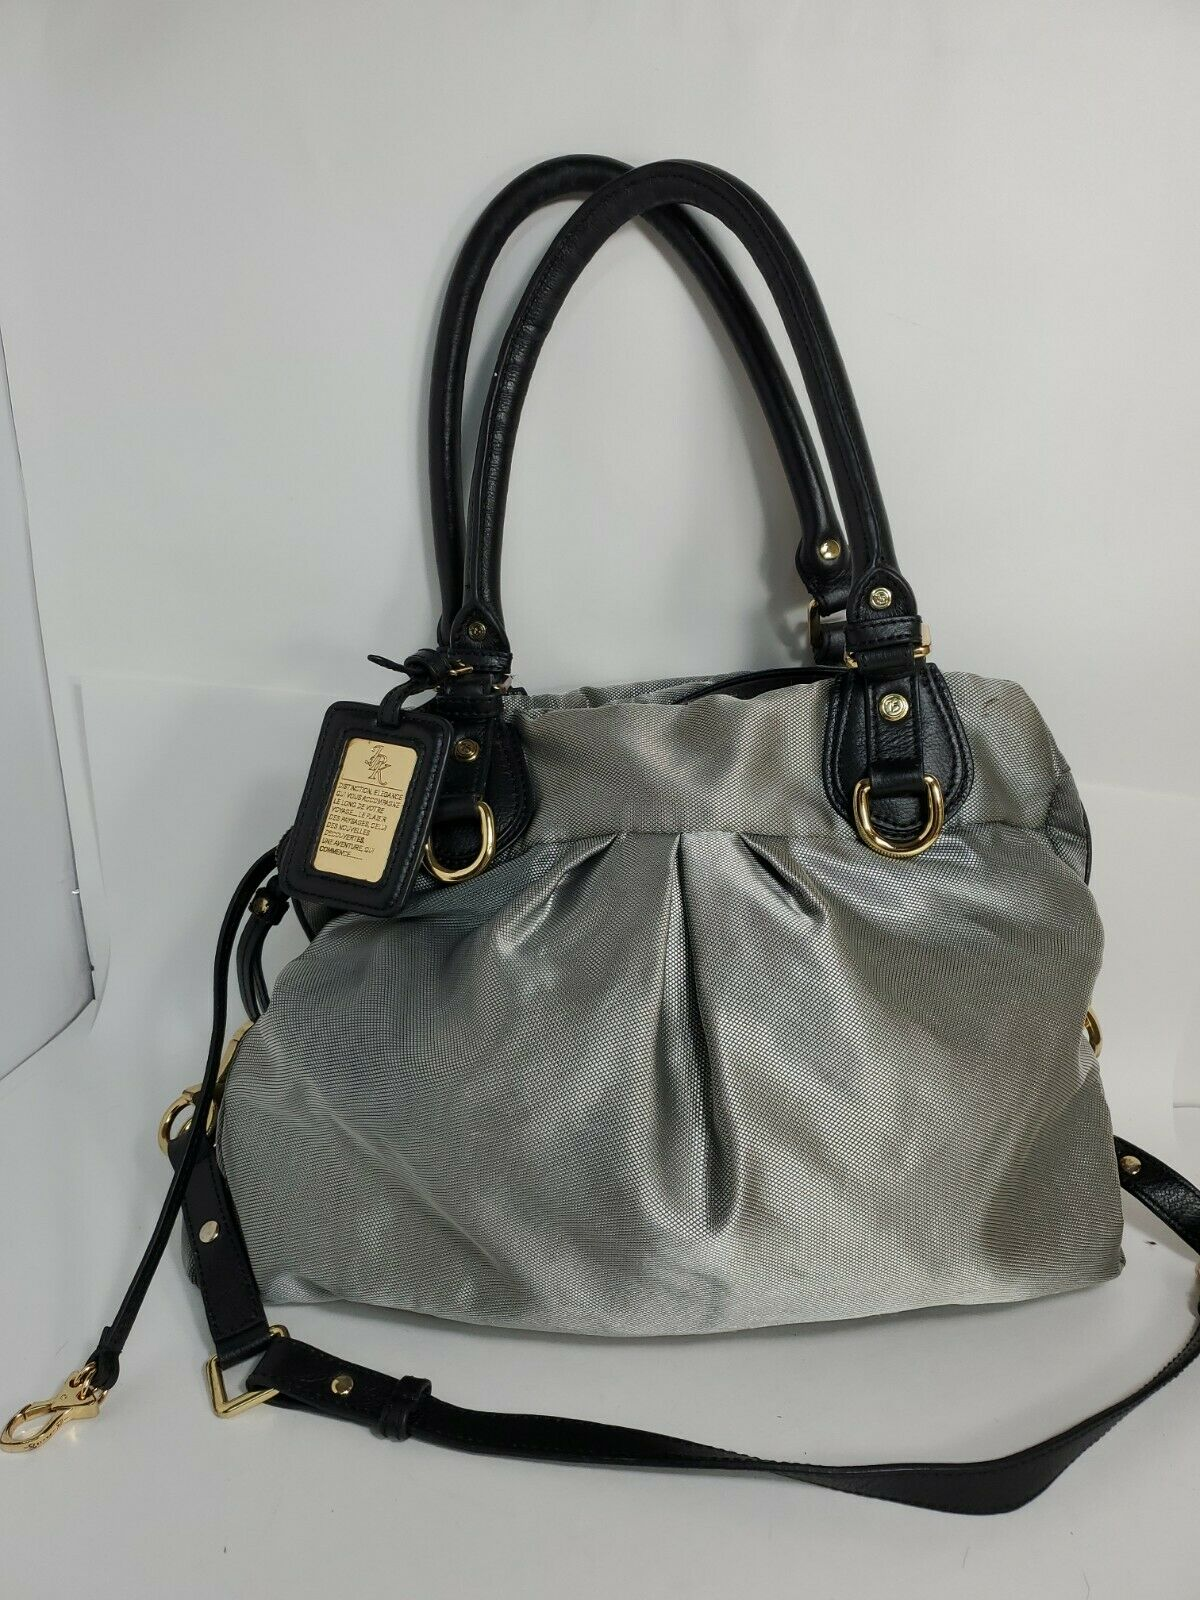 Jpk Paris 75 handbag Textile Silver Hobo Crossbody/ Shoulder Bag 15x13.5x3